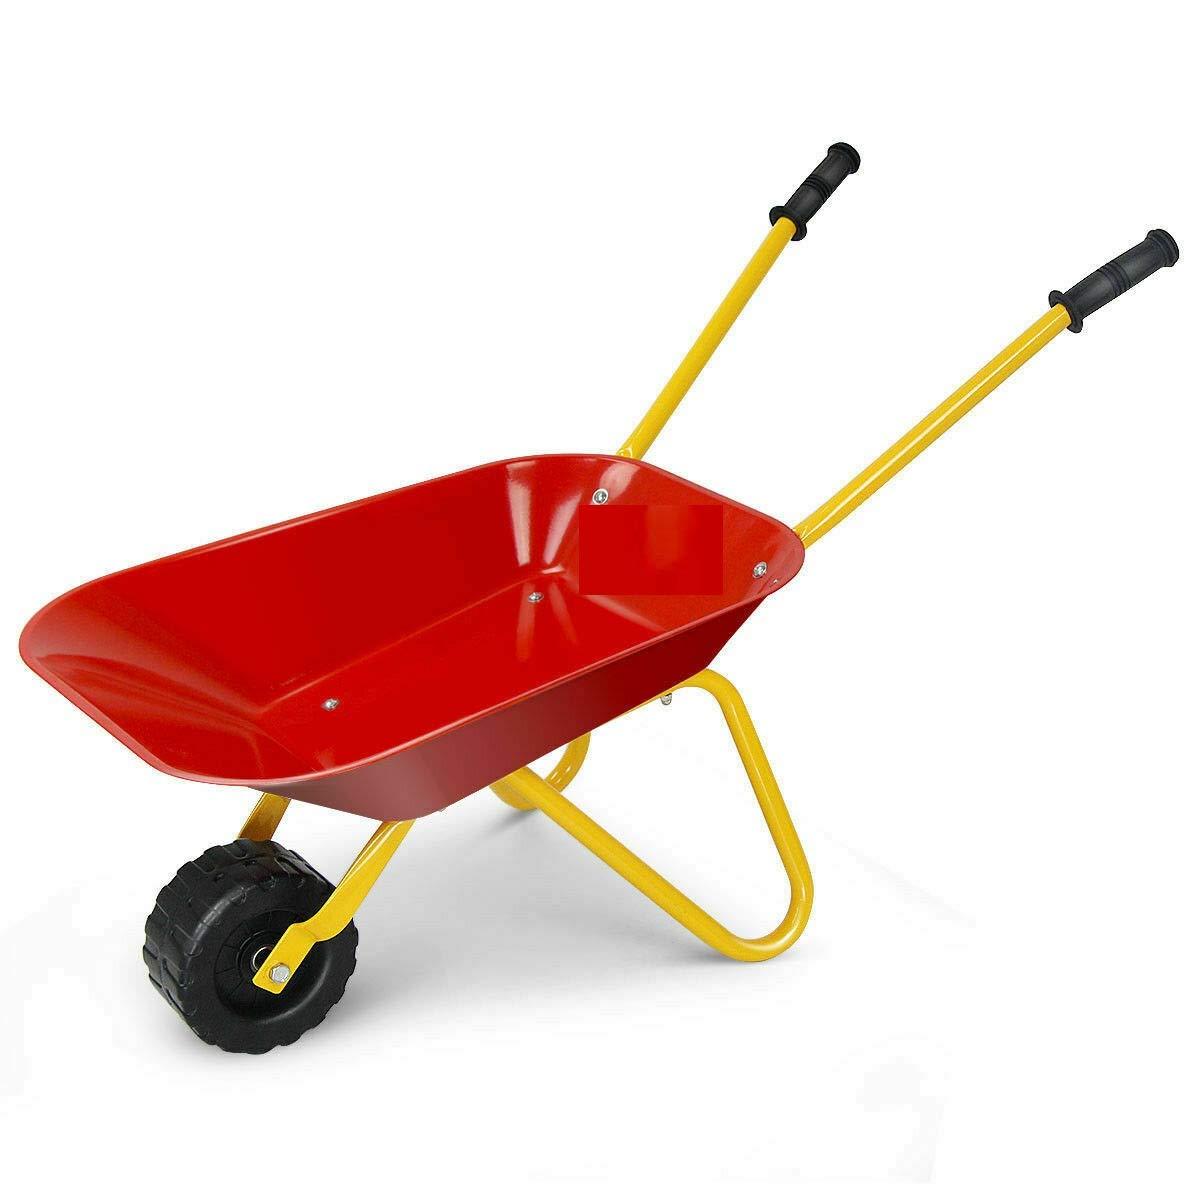 Heize best price Red Kids Metal Wheelbarrow Children's Size Outdoor Garden Backyard Play Toy by Heize best price (Image #1)